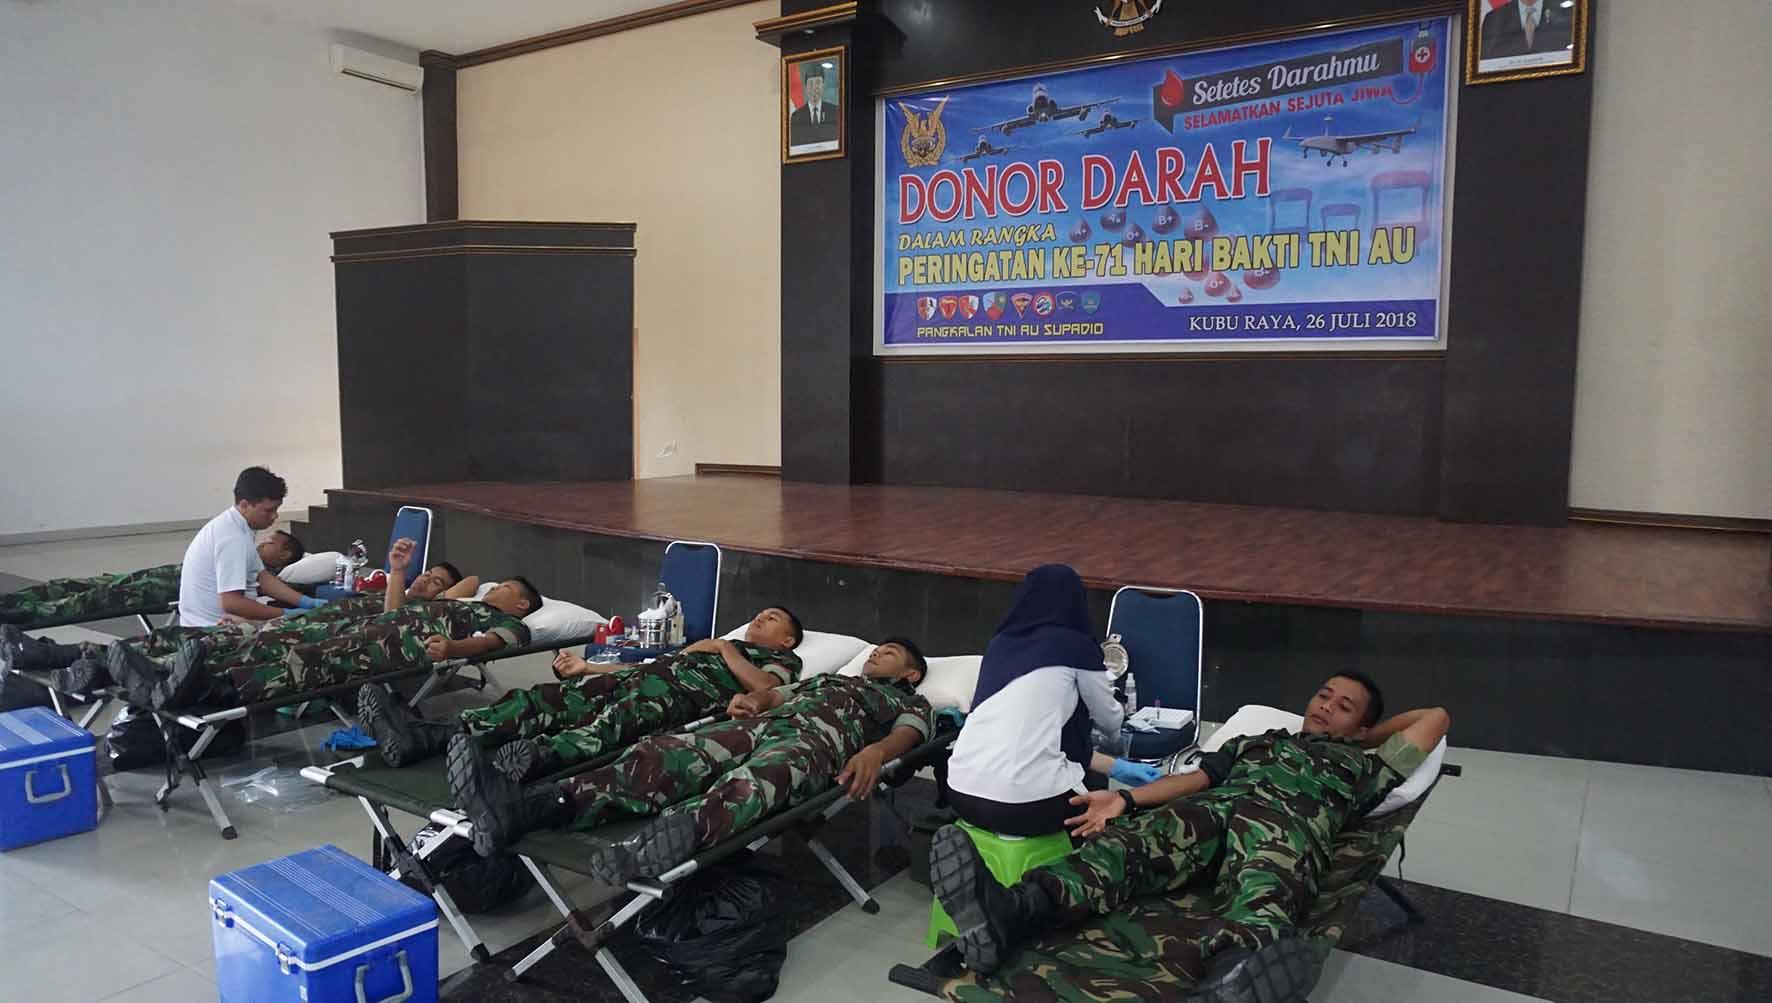 Yonko 465 Paskhas Donor Darah Memperingati Hari Bakti TNI AU Ke-71